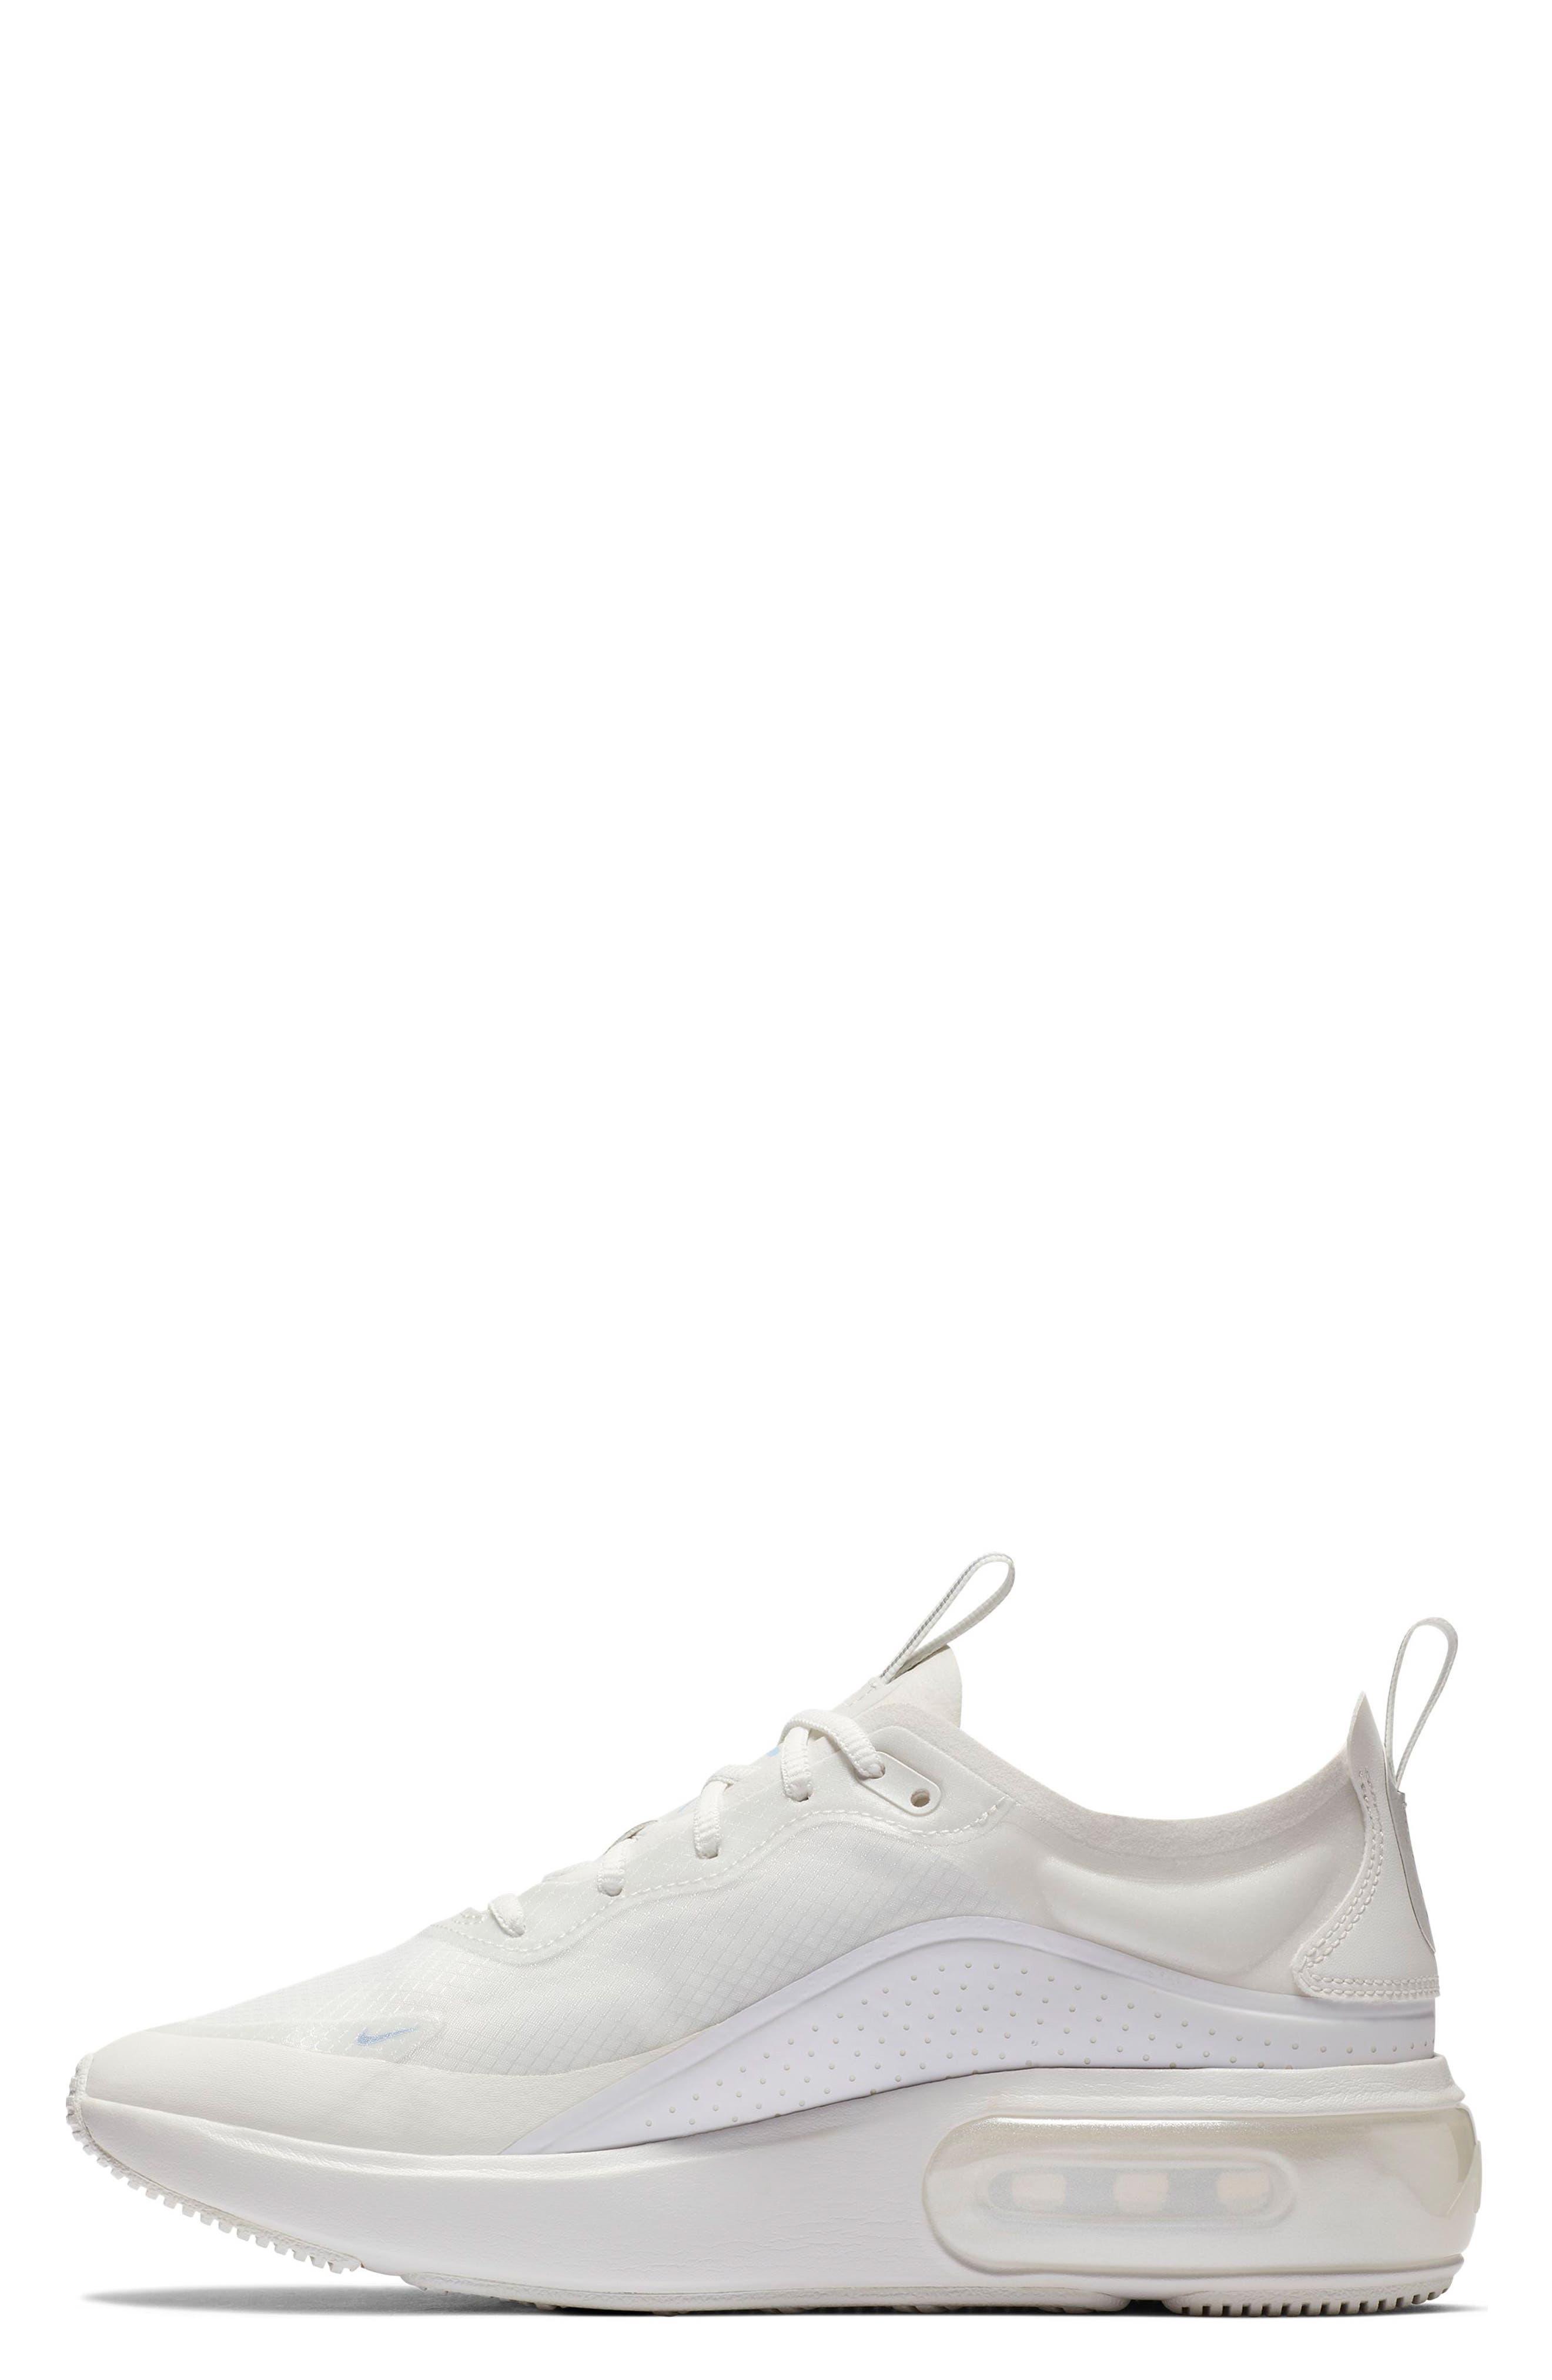 Air Max DIA SE Running Shoe,                             Alternate thumbnail 3, color,                             WHITE/ ALUMINUM/ WHITE